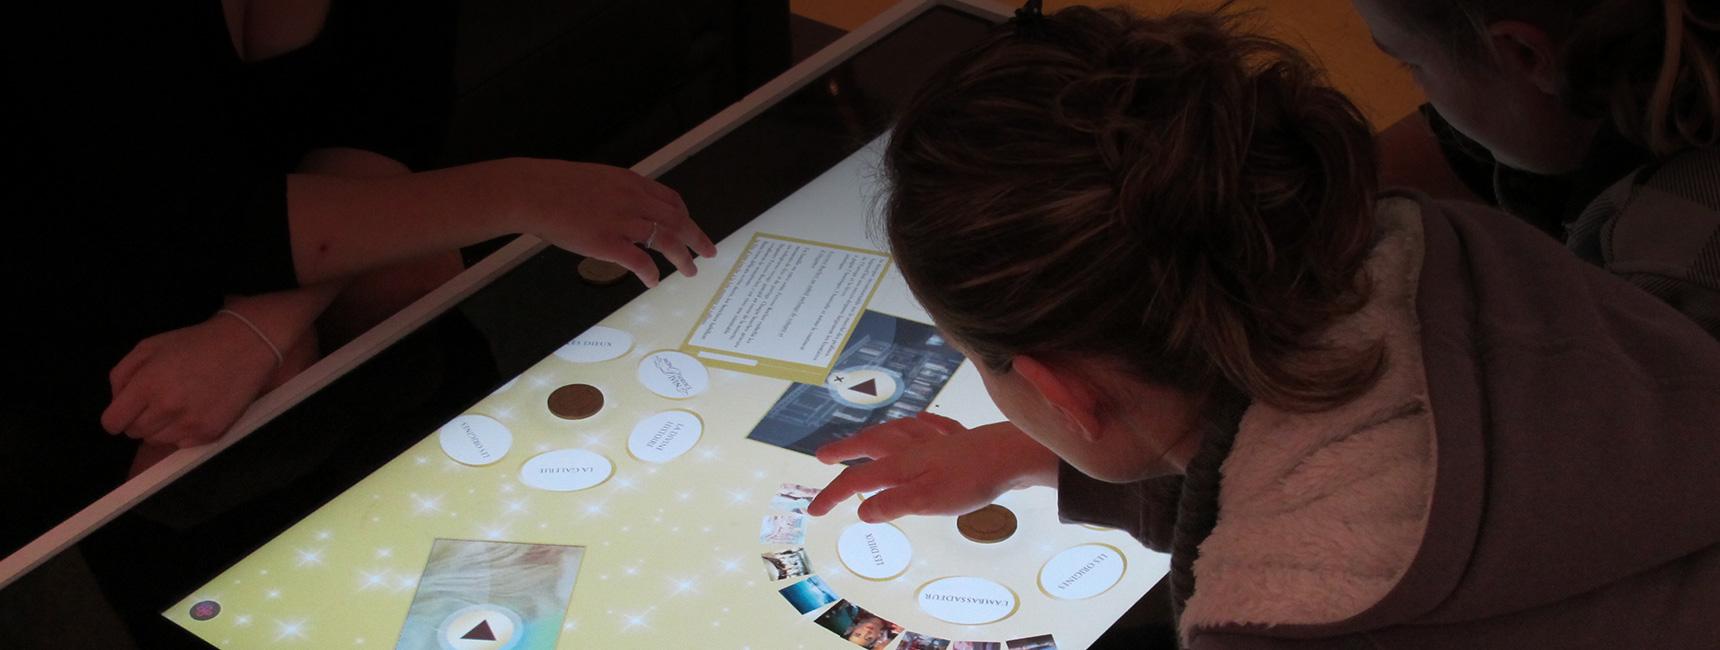 Immersion virtuelle avec Ferrero - Keemia Shopper Marketing - Agence d'activation shopper marketing phygitale